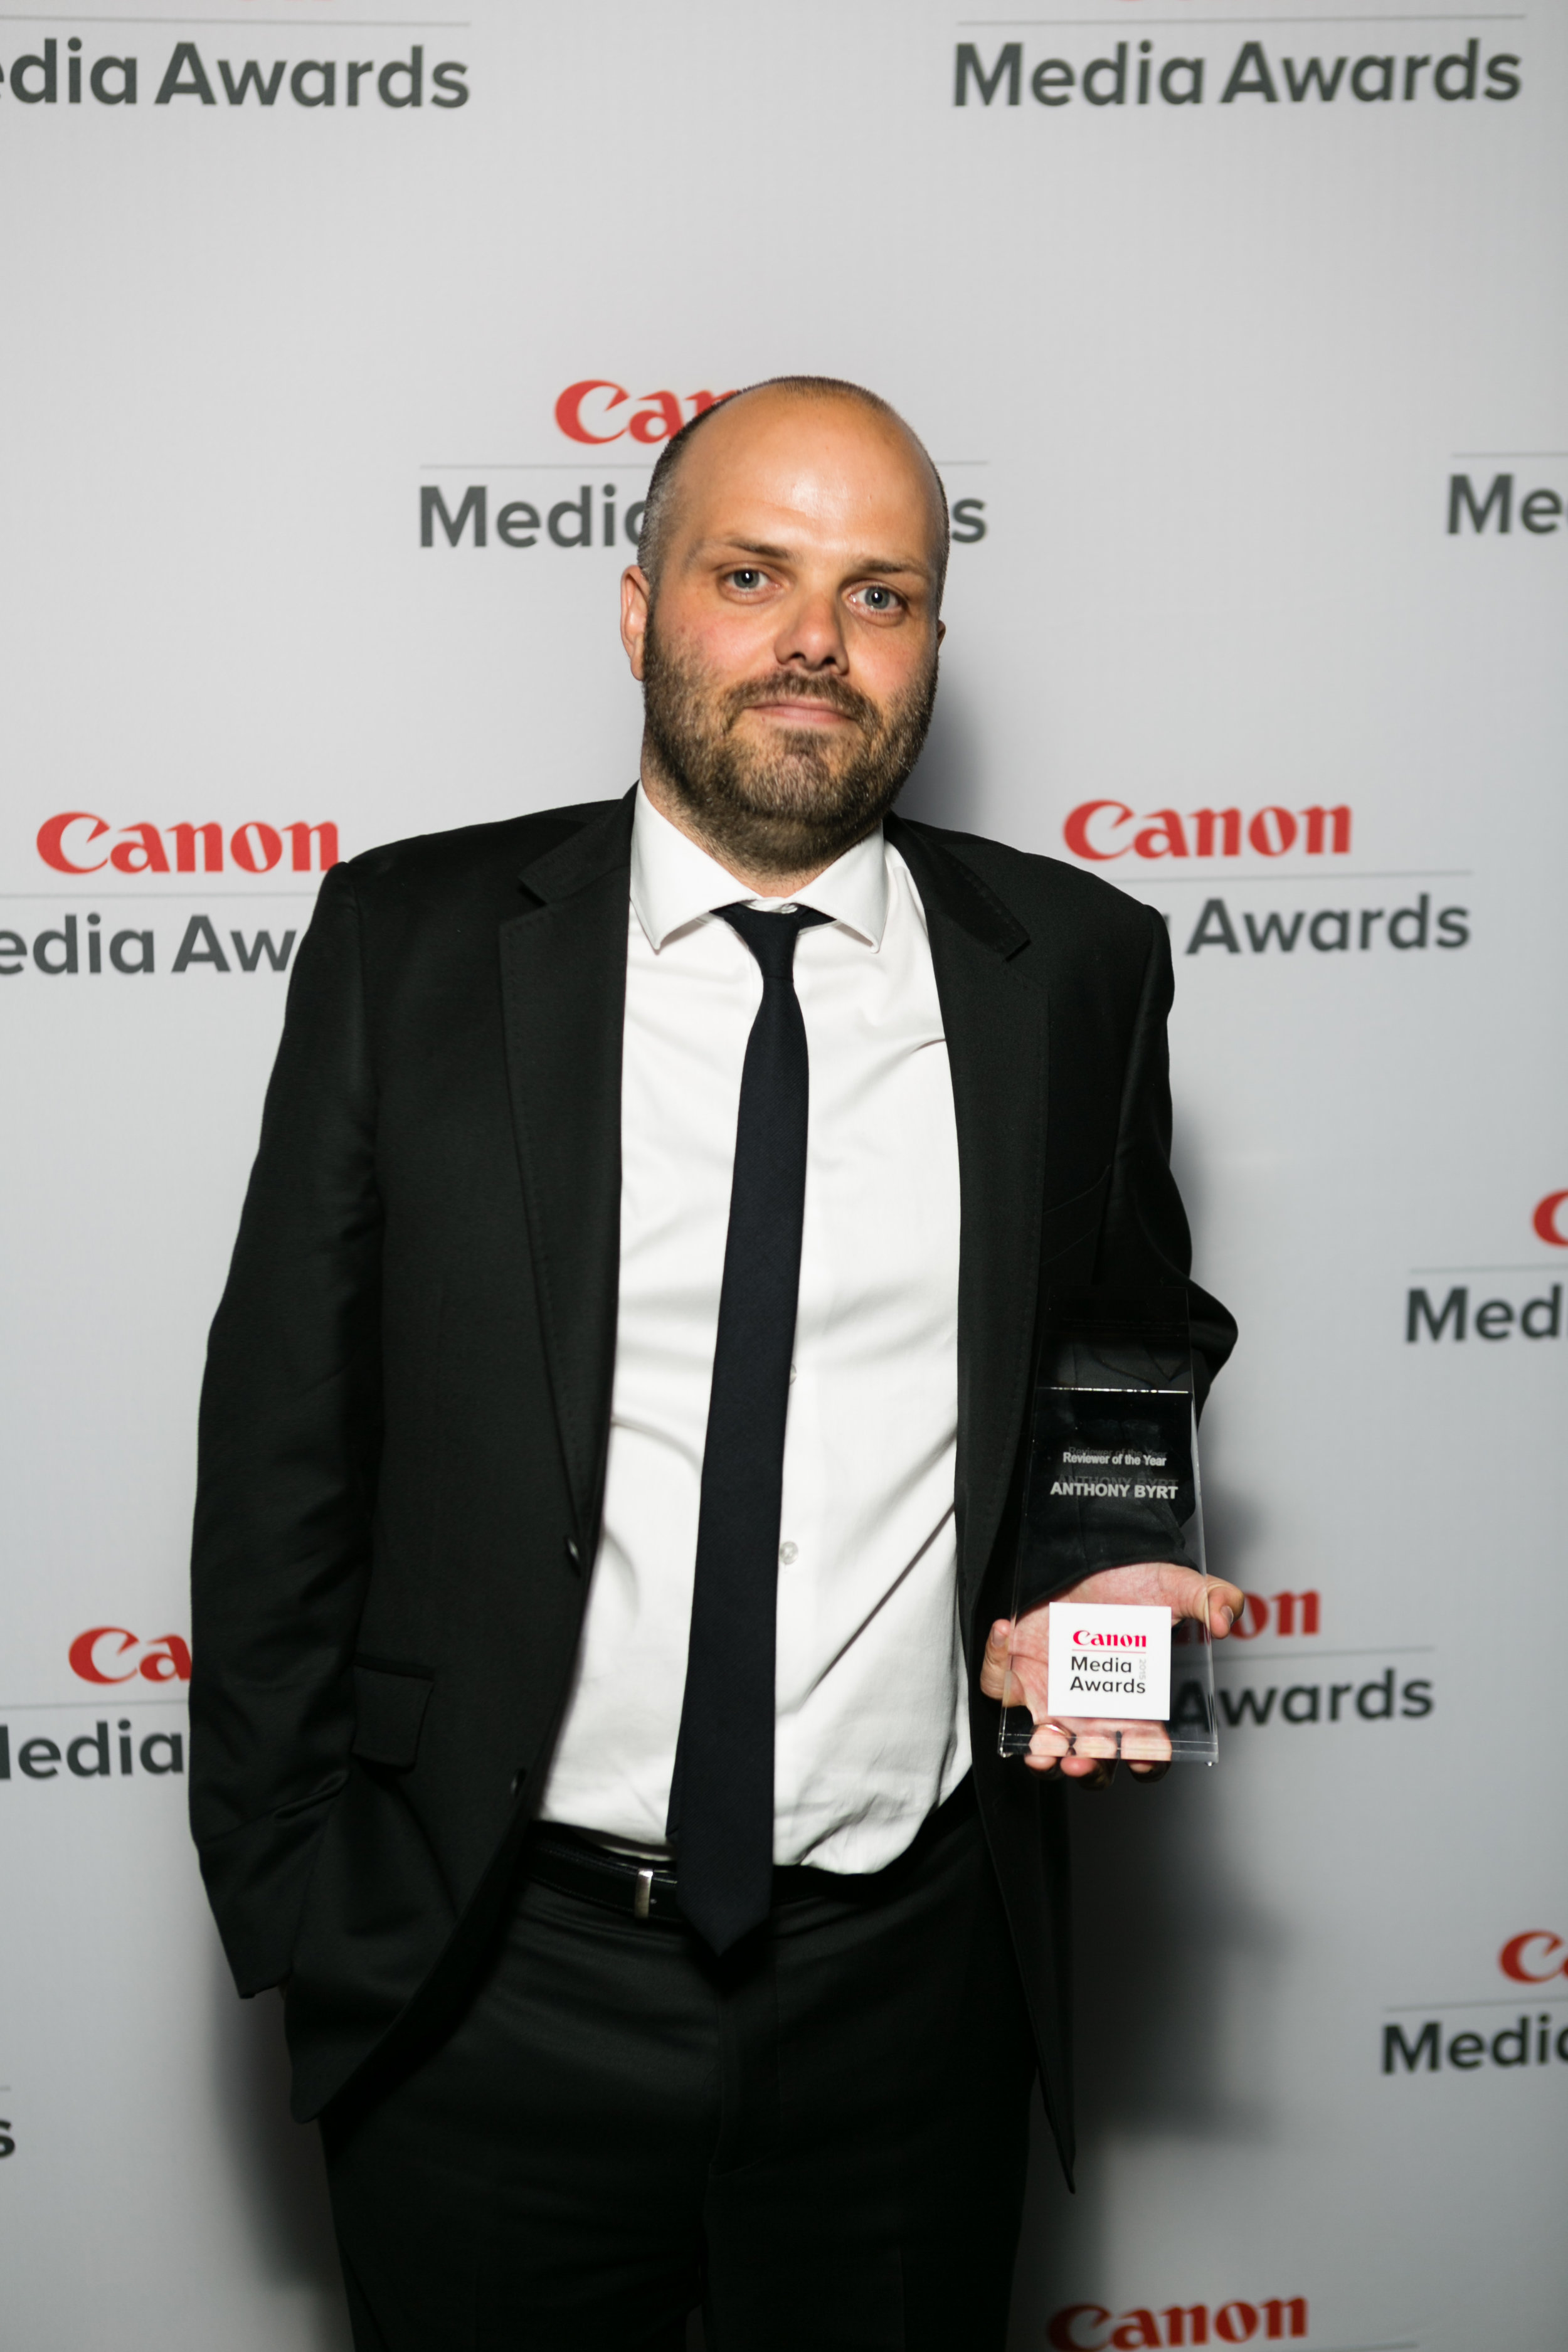 canon_media_awards_2015_interlike_nz_clinton_tudor-5866-169.jpg